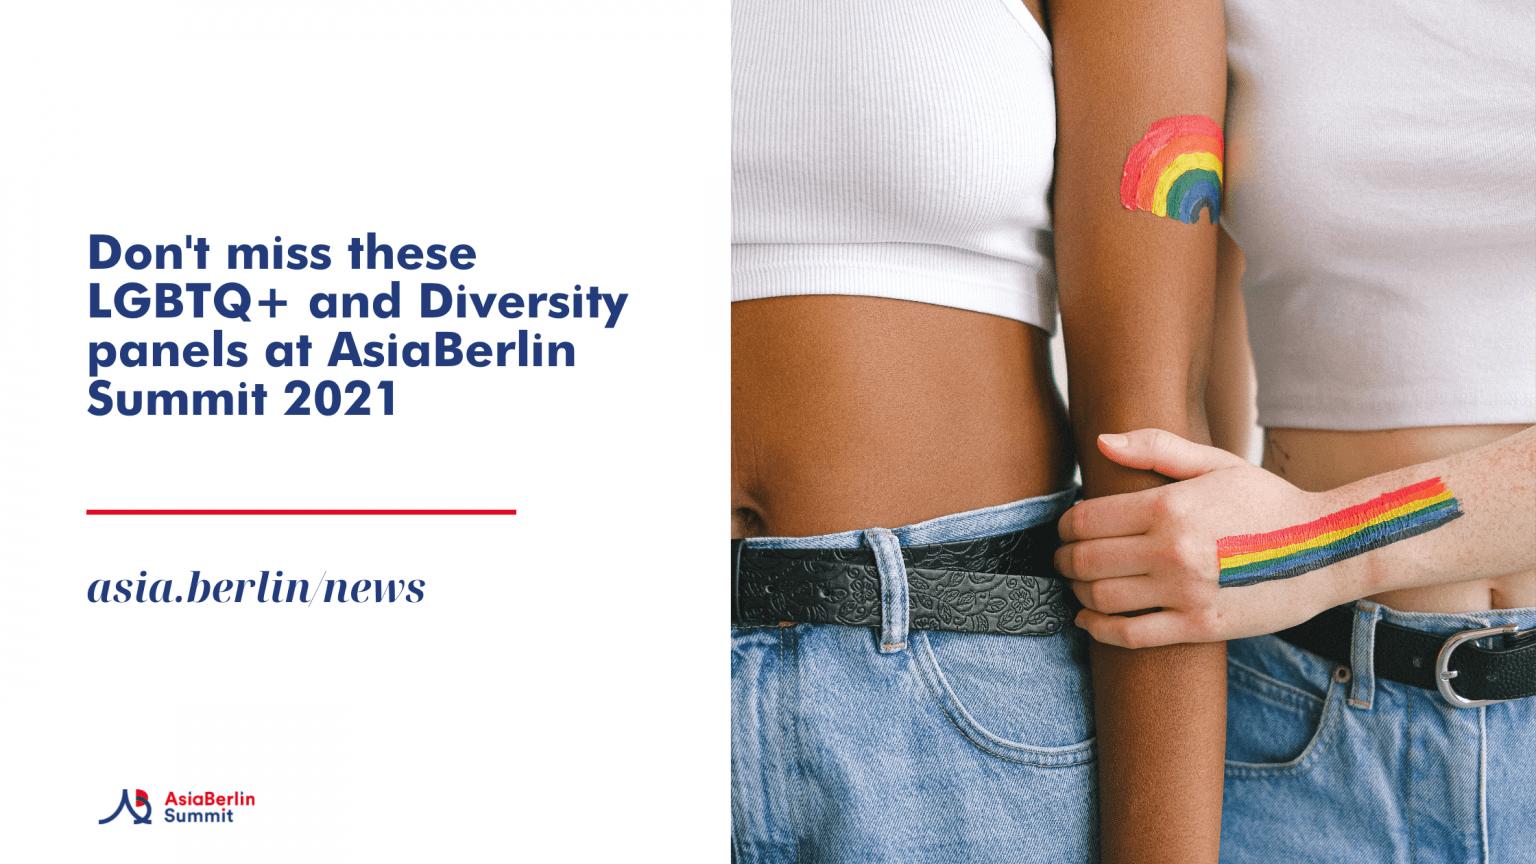 Sneak peek into LGBTQ+ and Diversity panels at AsiaBerlin Summit 2021